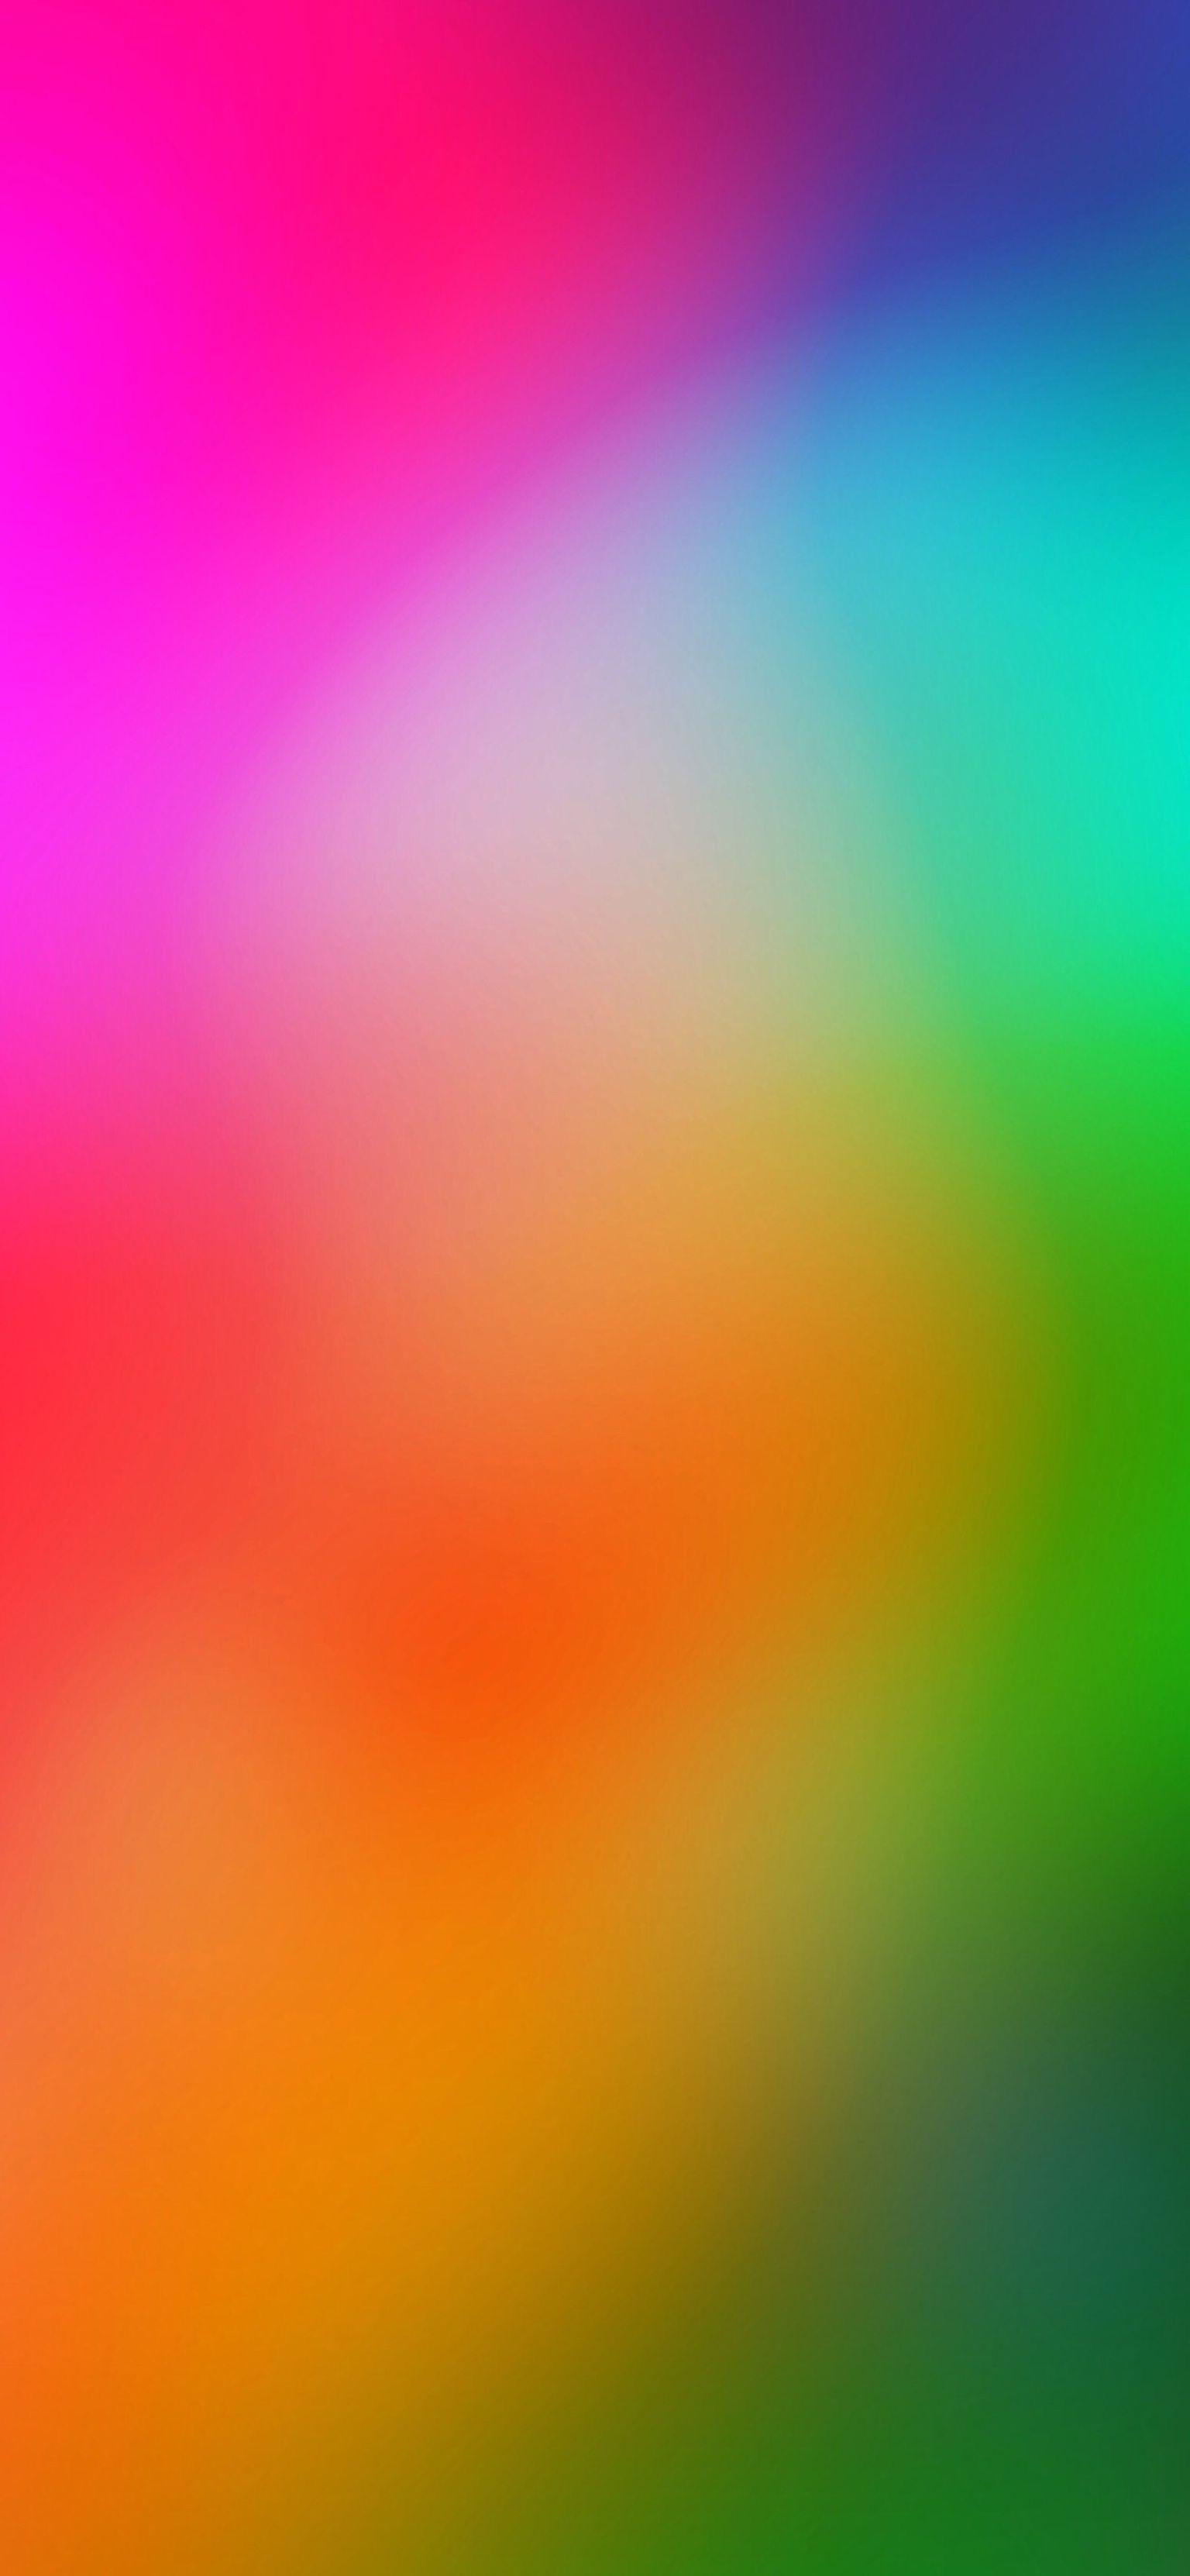 https://cdn.flow.page/images/2122e7f0-382d-4b0b-8f0e-f29b76d10d13-background?m=1616434439